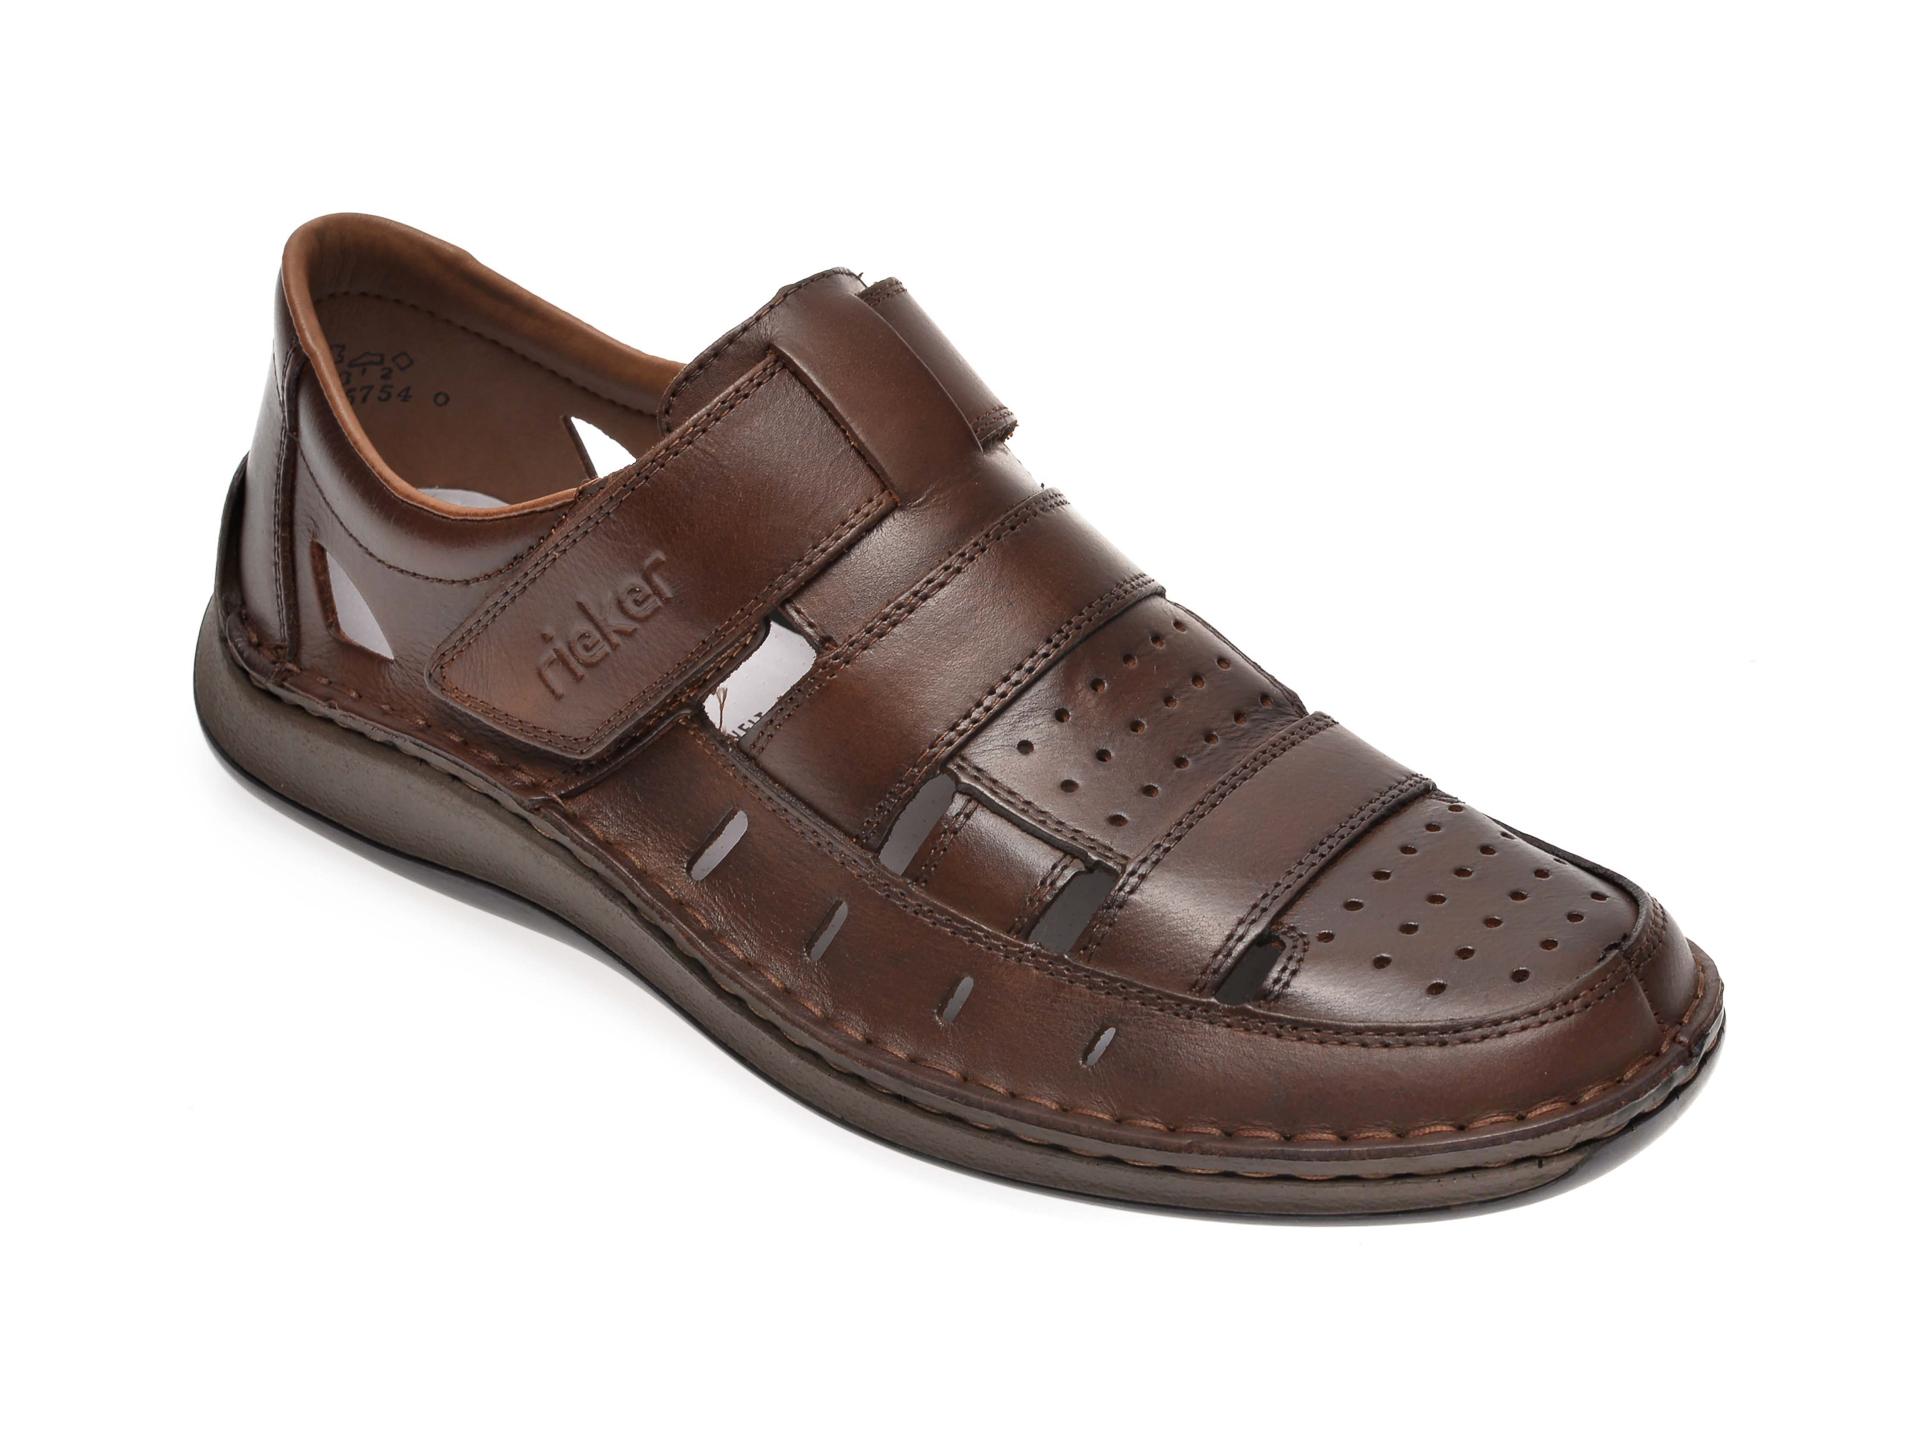 Sandale RIEKER maro, 05268, din piele naturala imagine